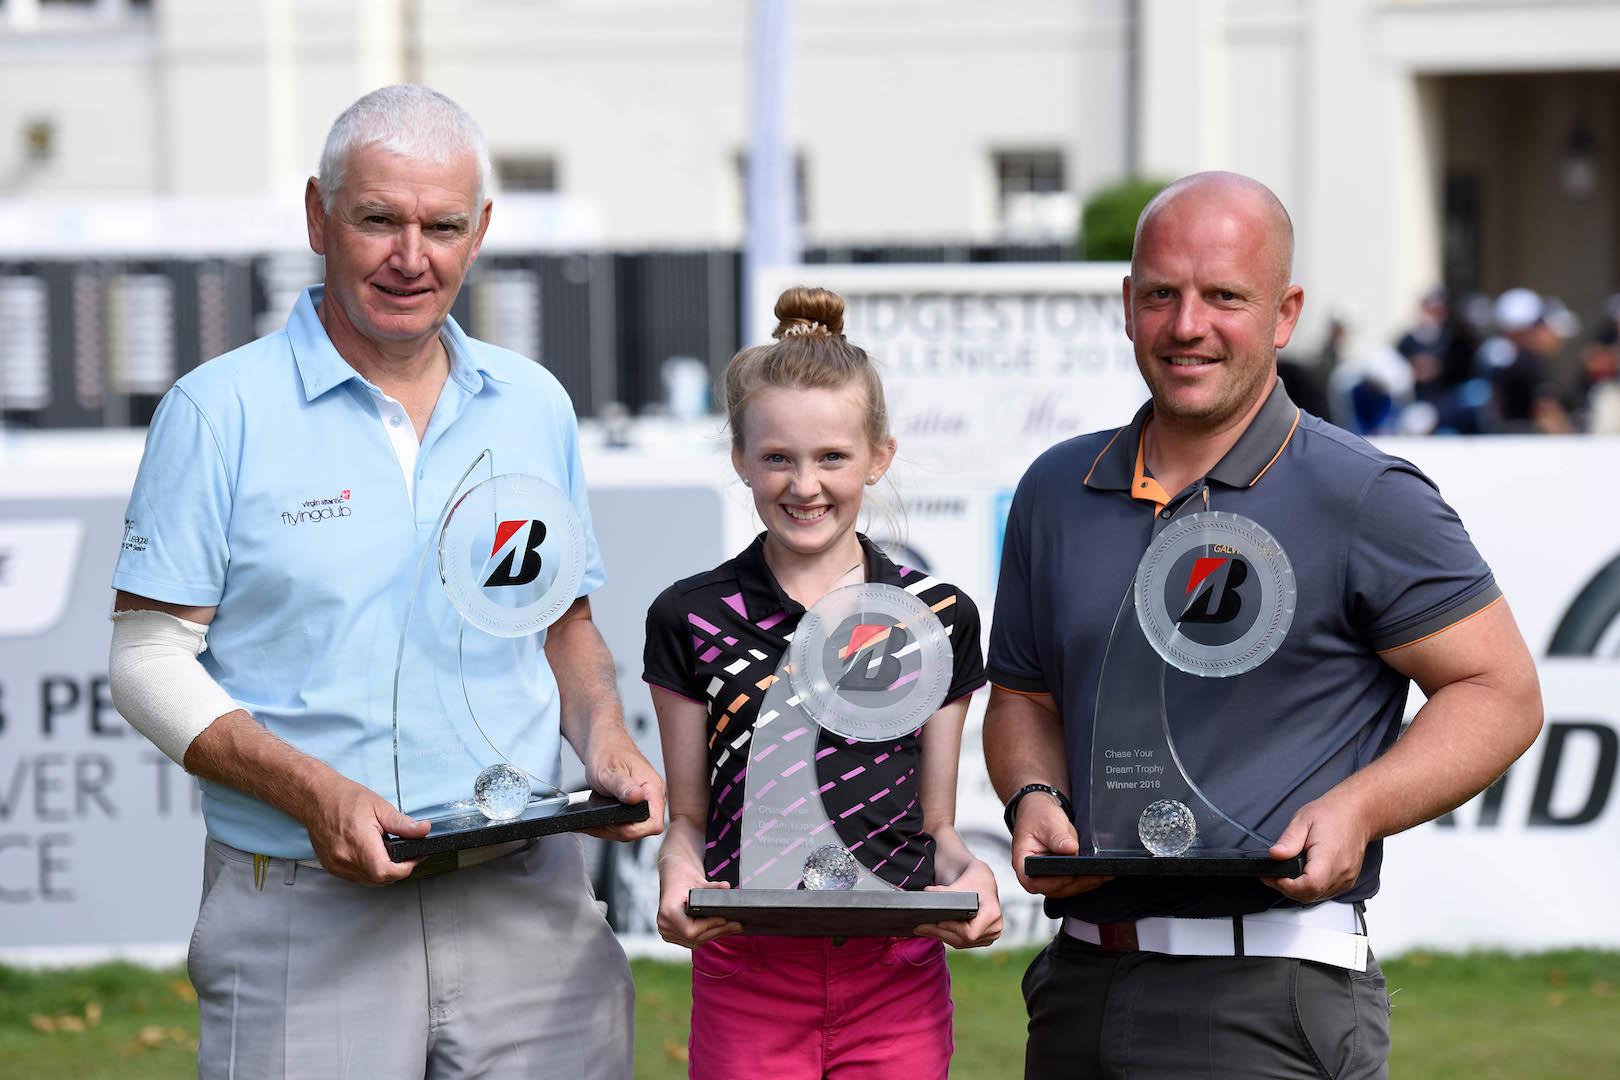 Golfing trio to realise dreams with Bridgestone at British Masters